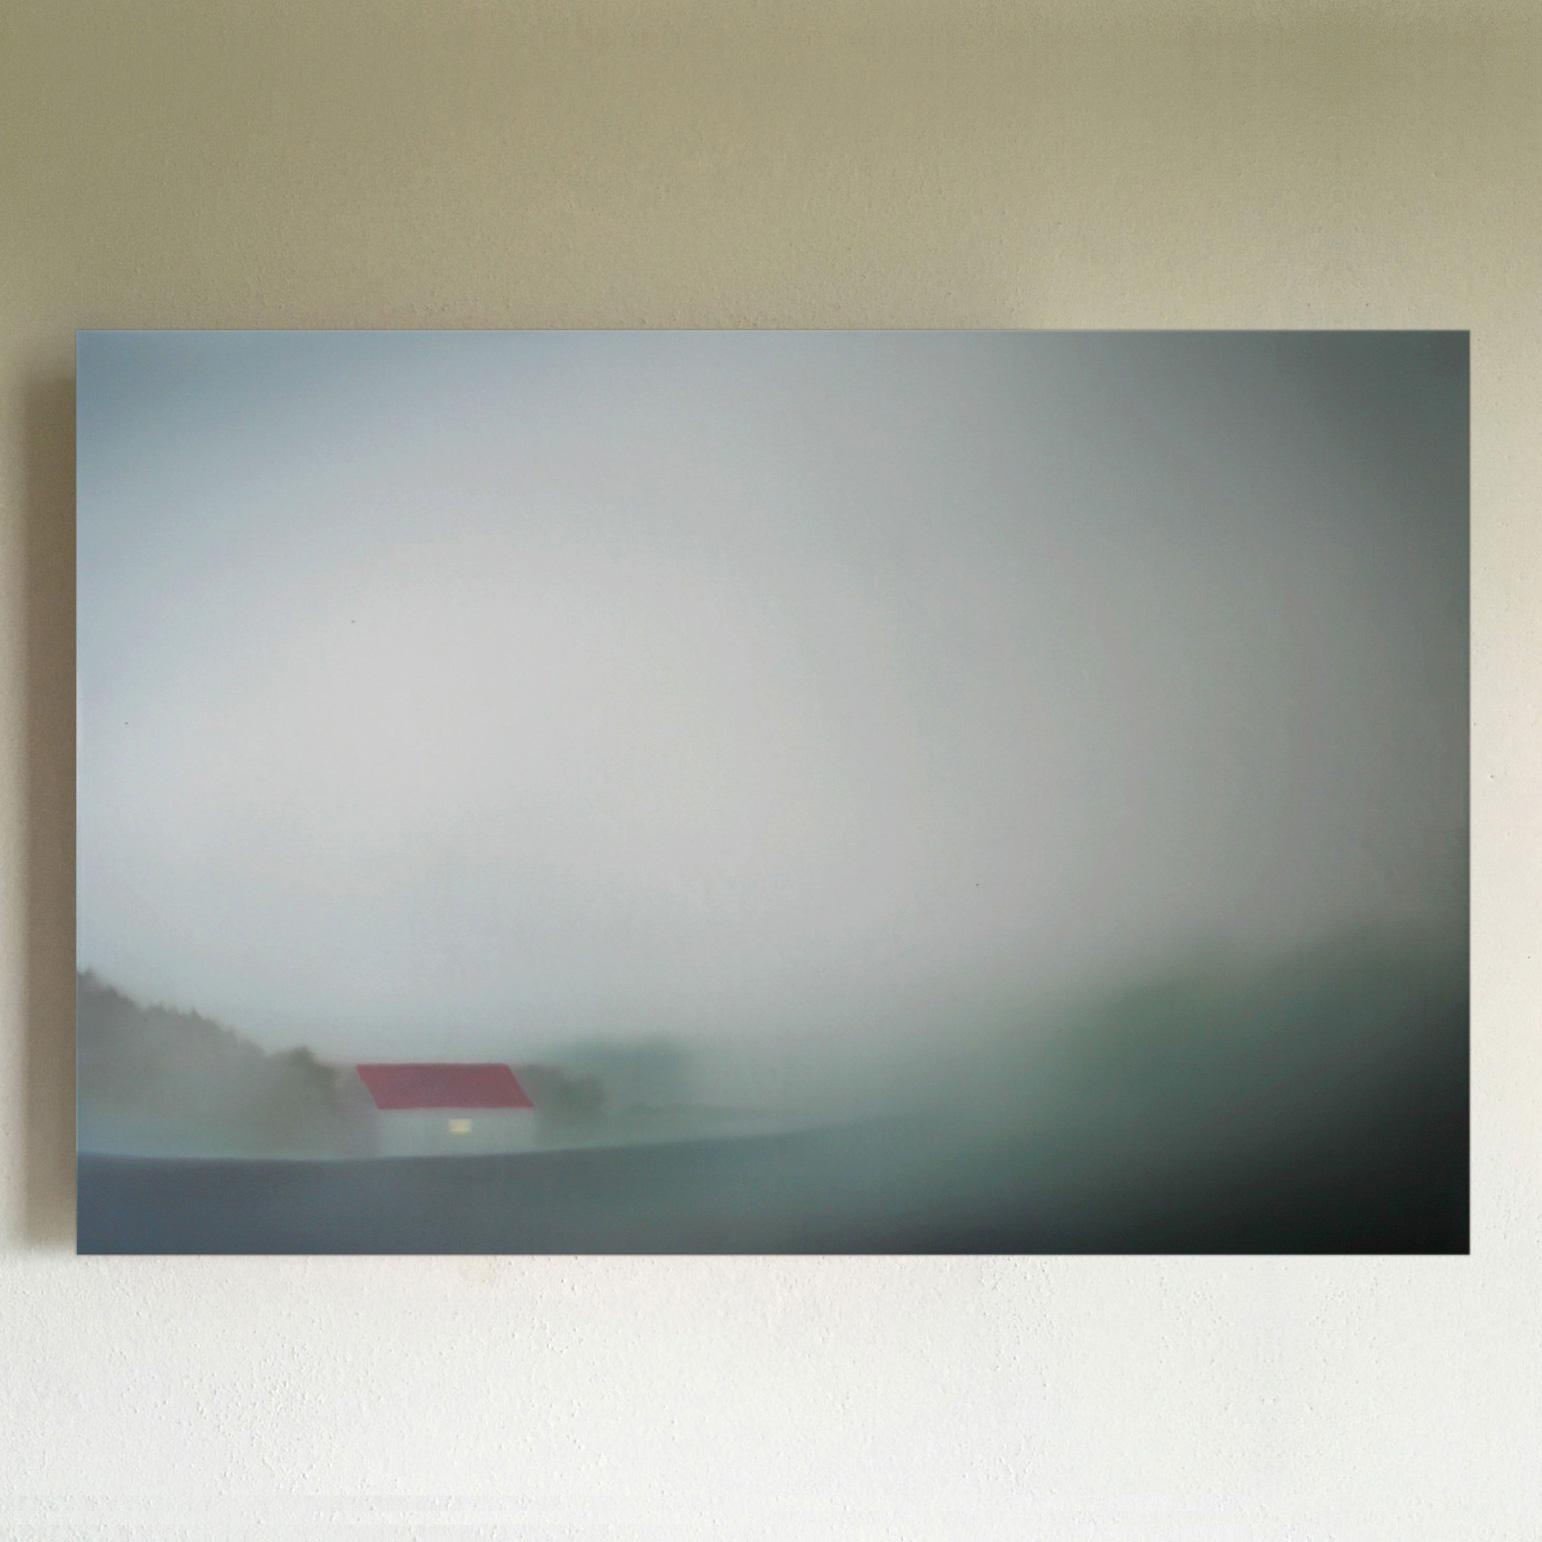 T#69-2010, oil on canvas, 80x120cm, priv. coll.